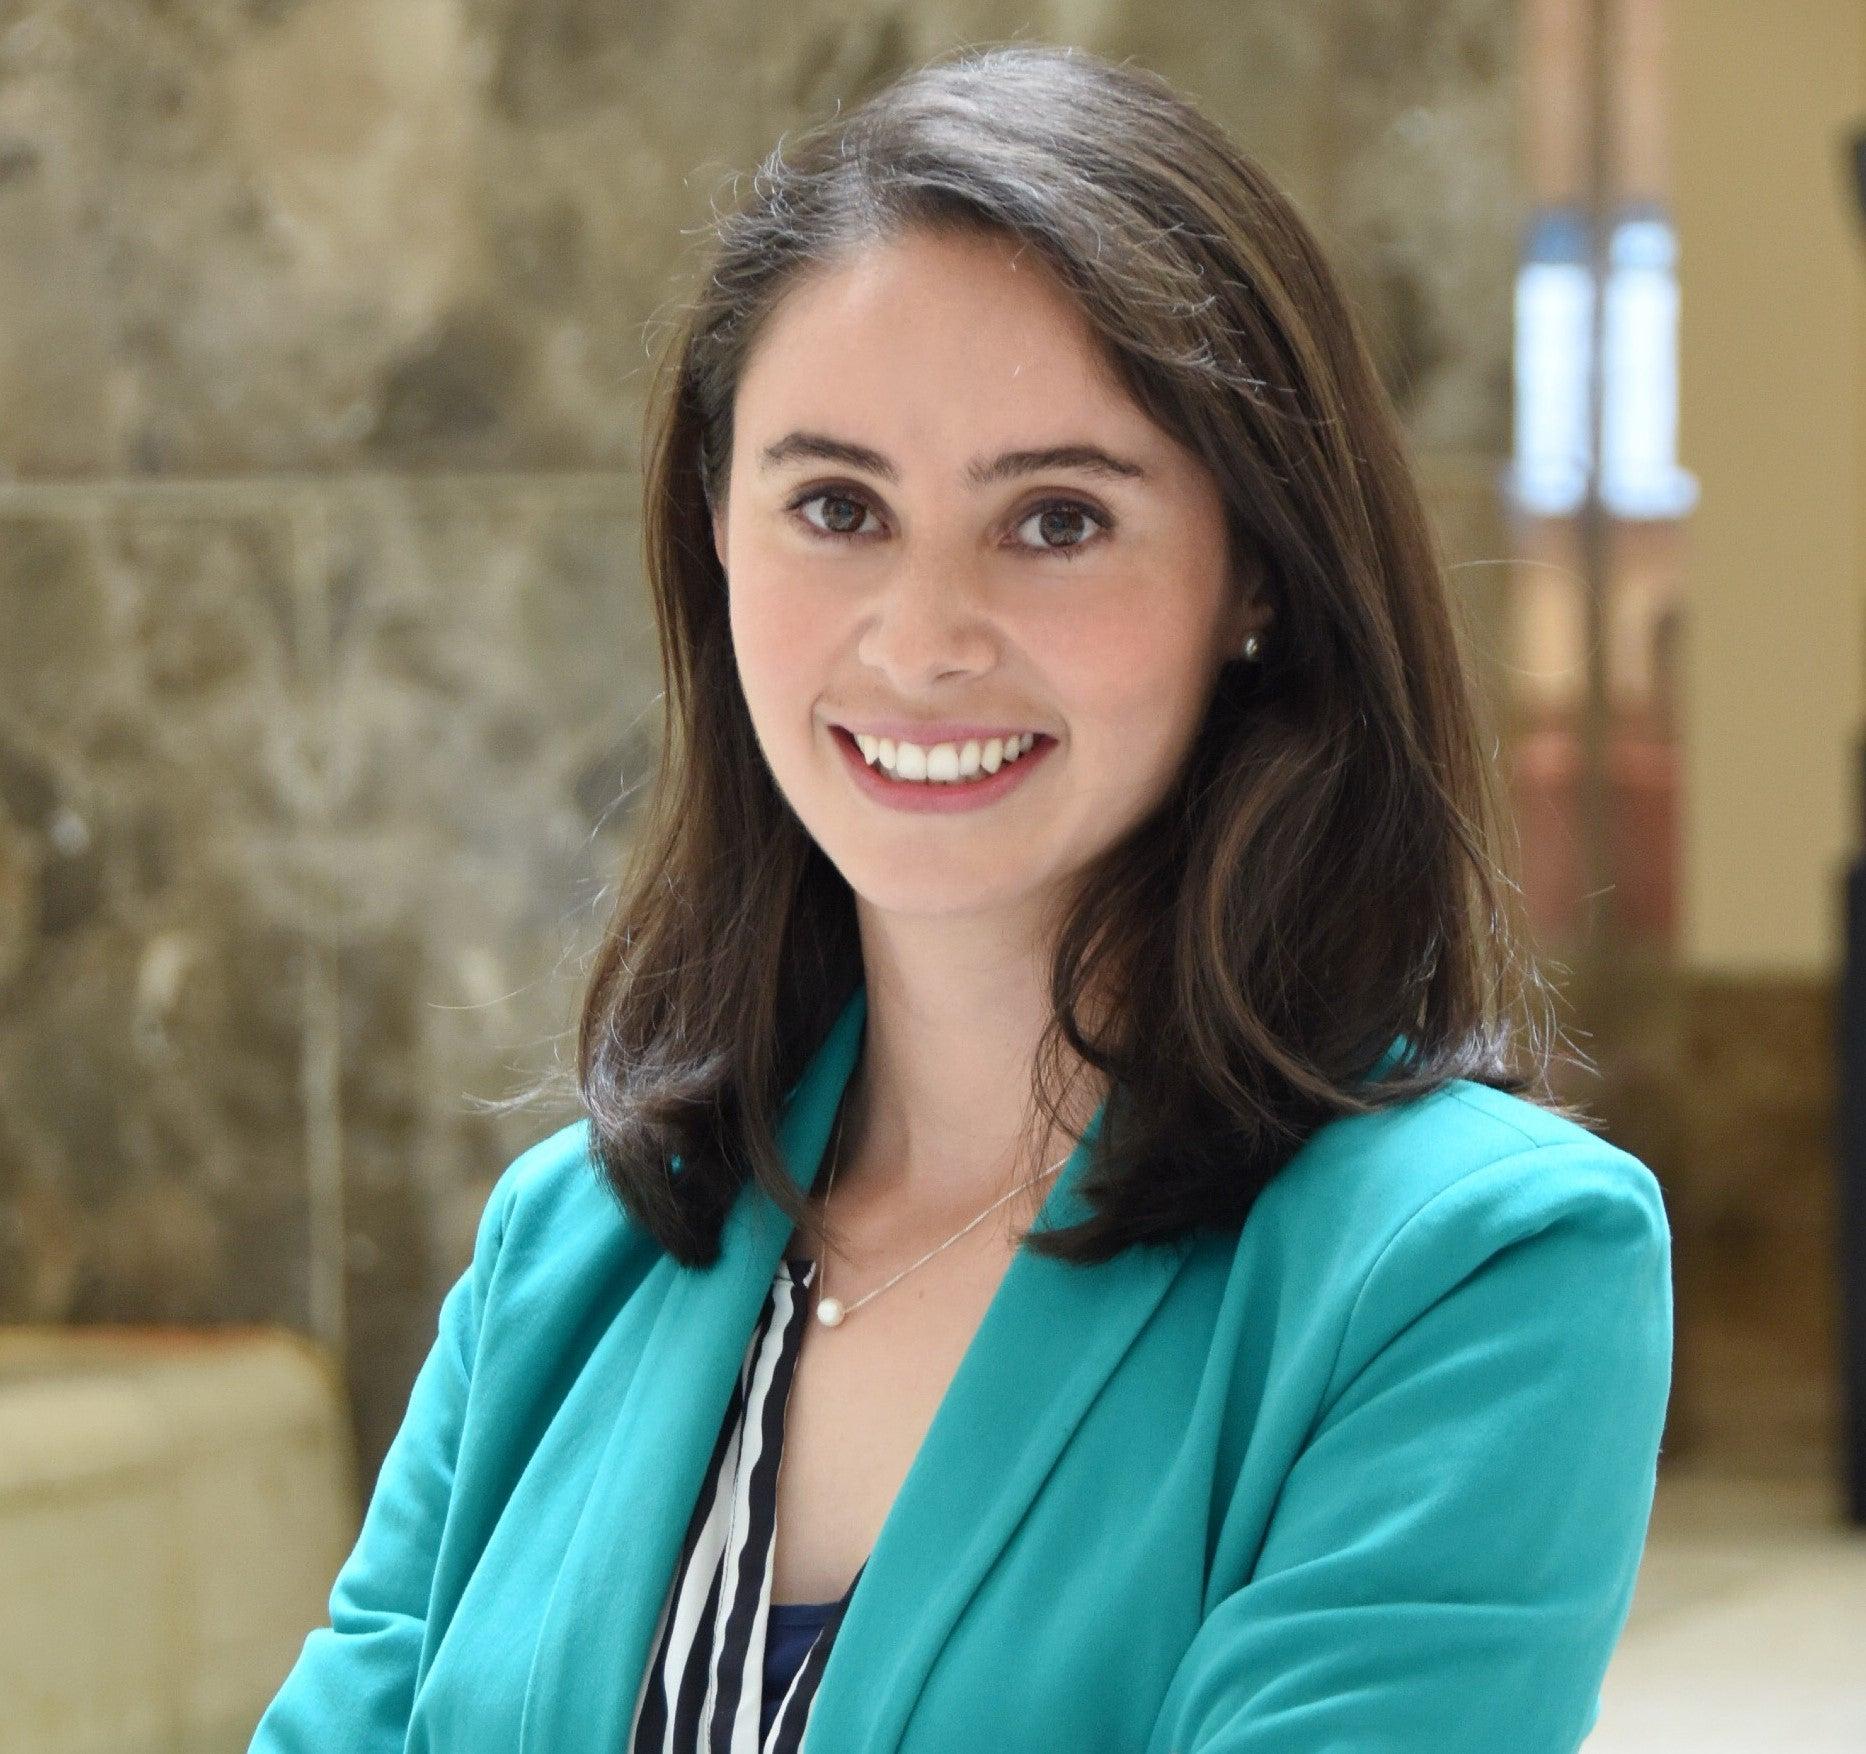 Daniela Zuloaga